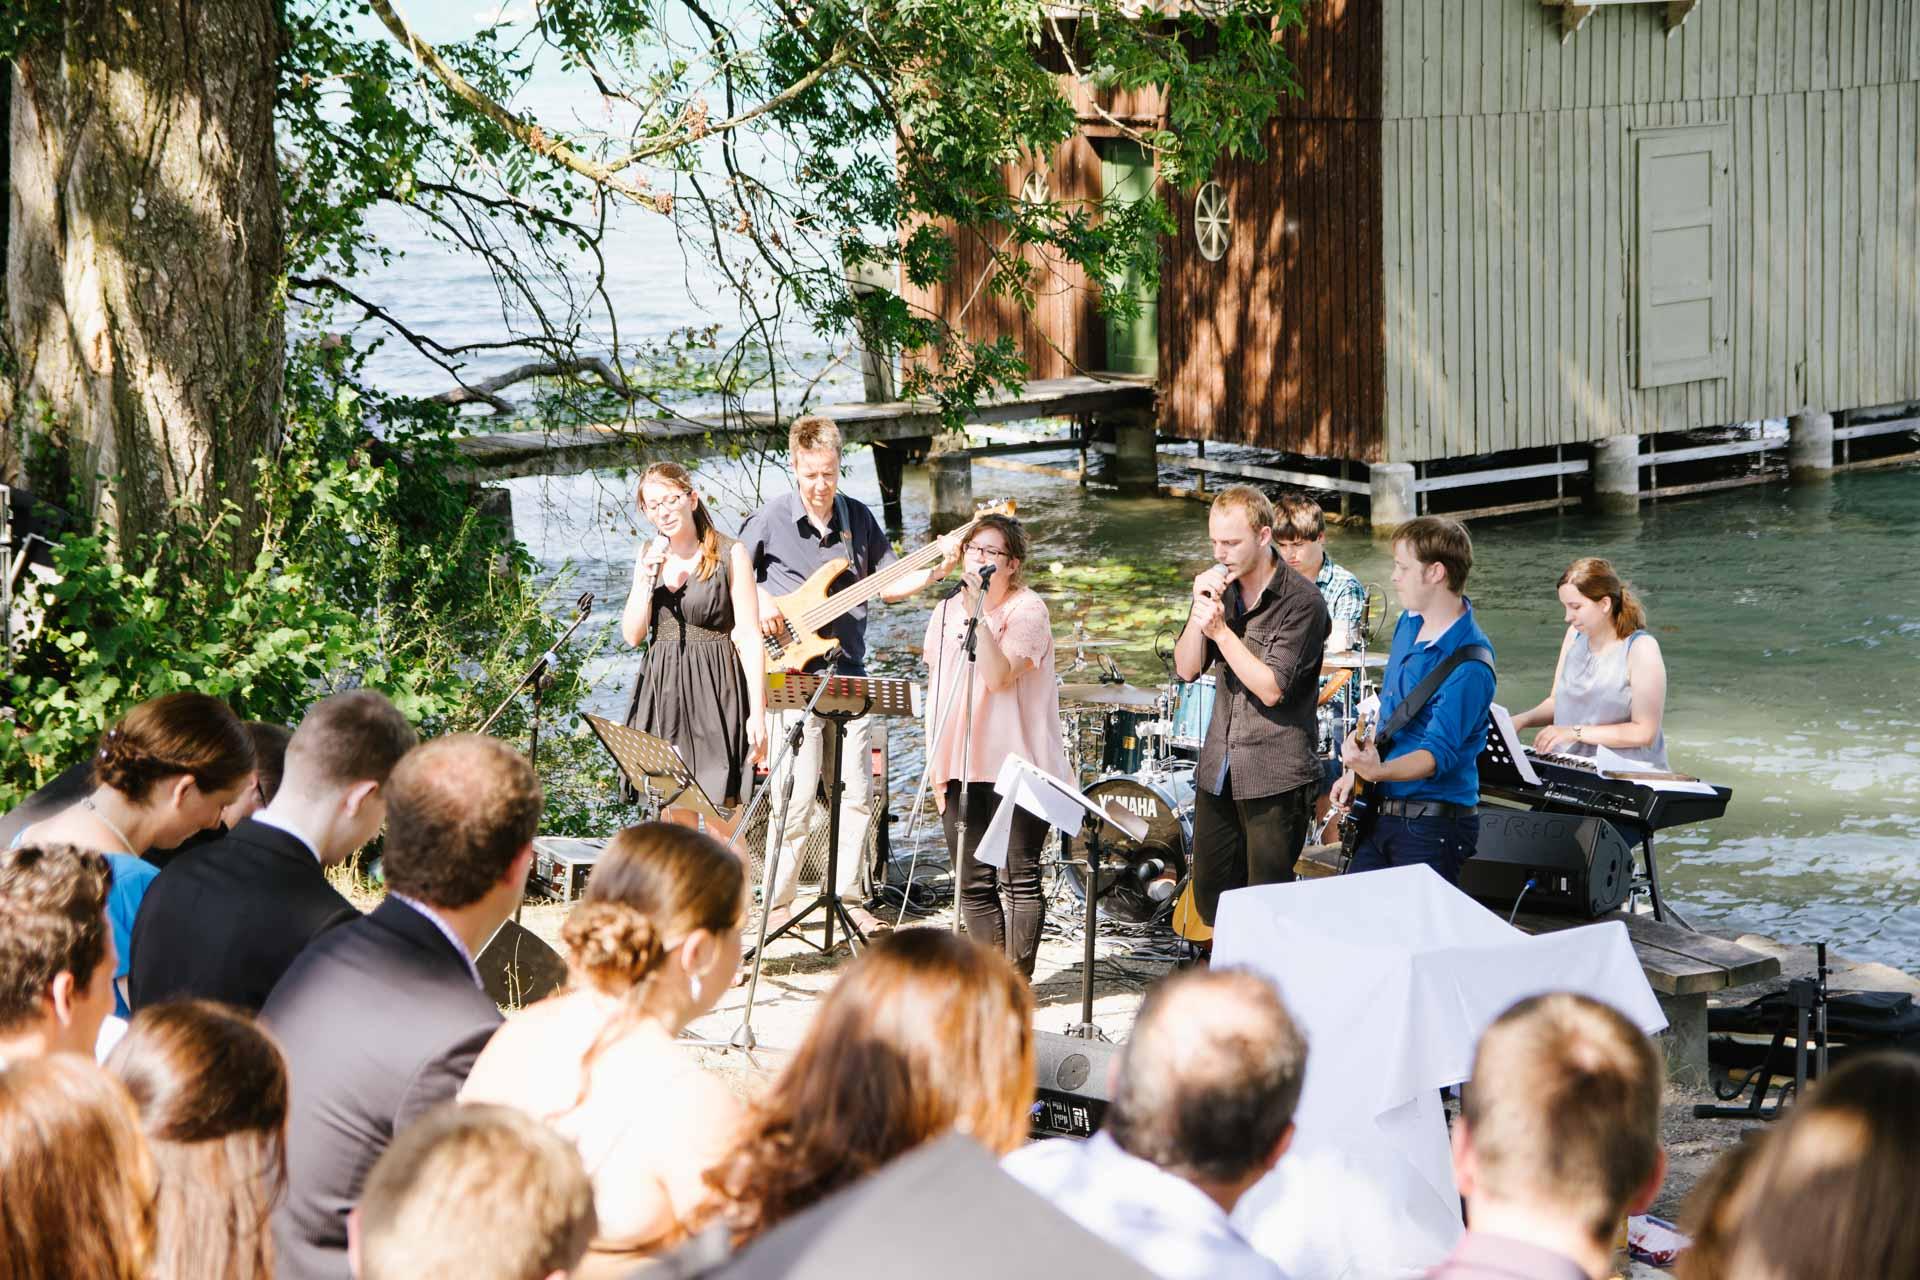 Pixelart_Hochzeitsfotografen_Loerrach_Rheinfelden_Hallwil_Schweiz_Linda-Ramon-1026